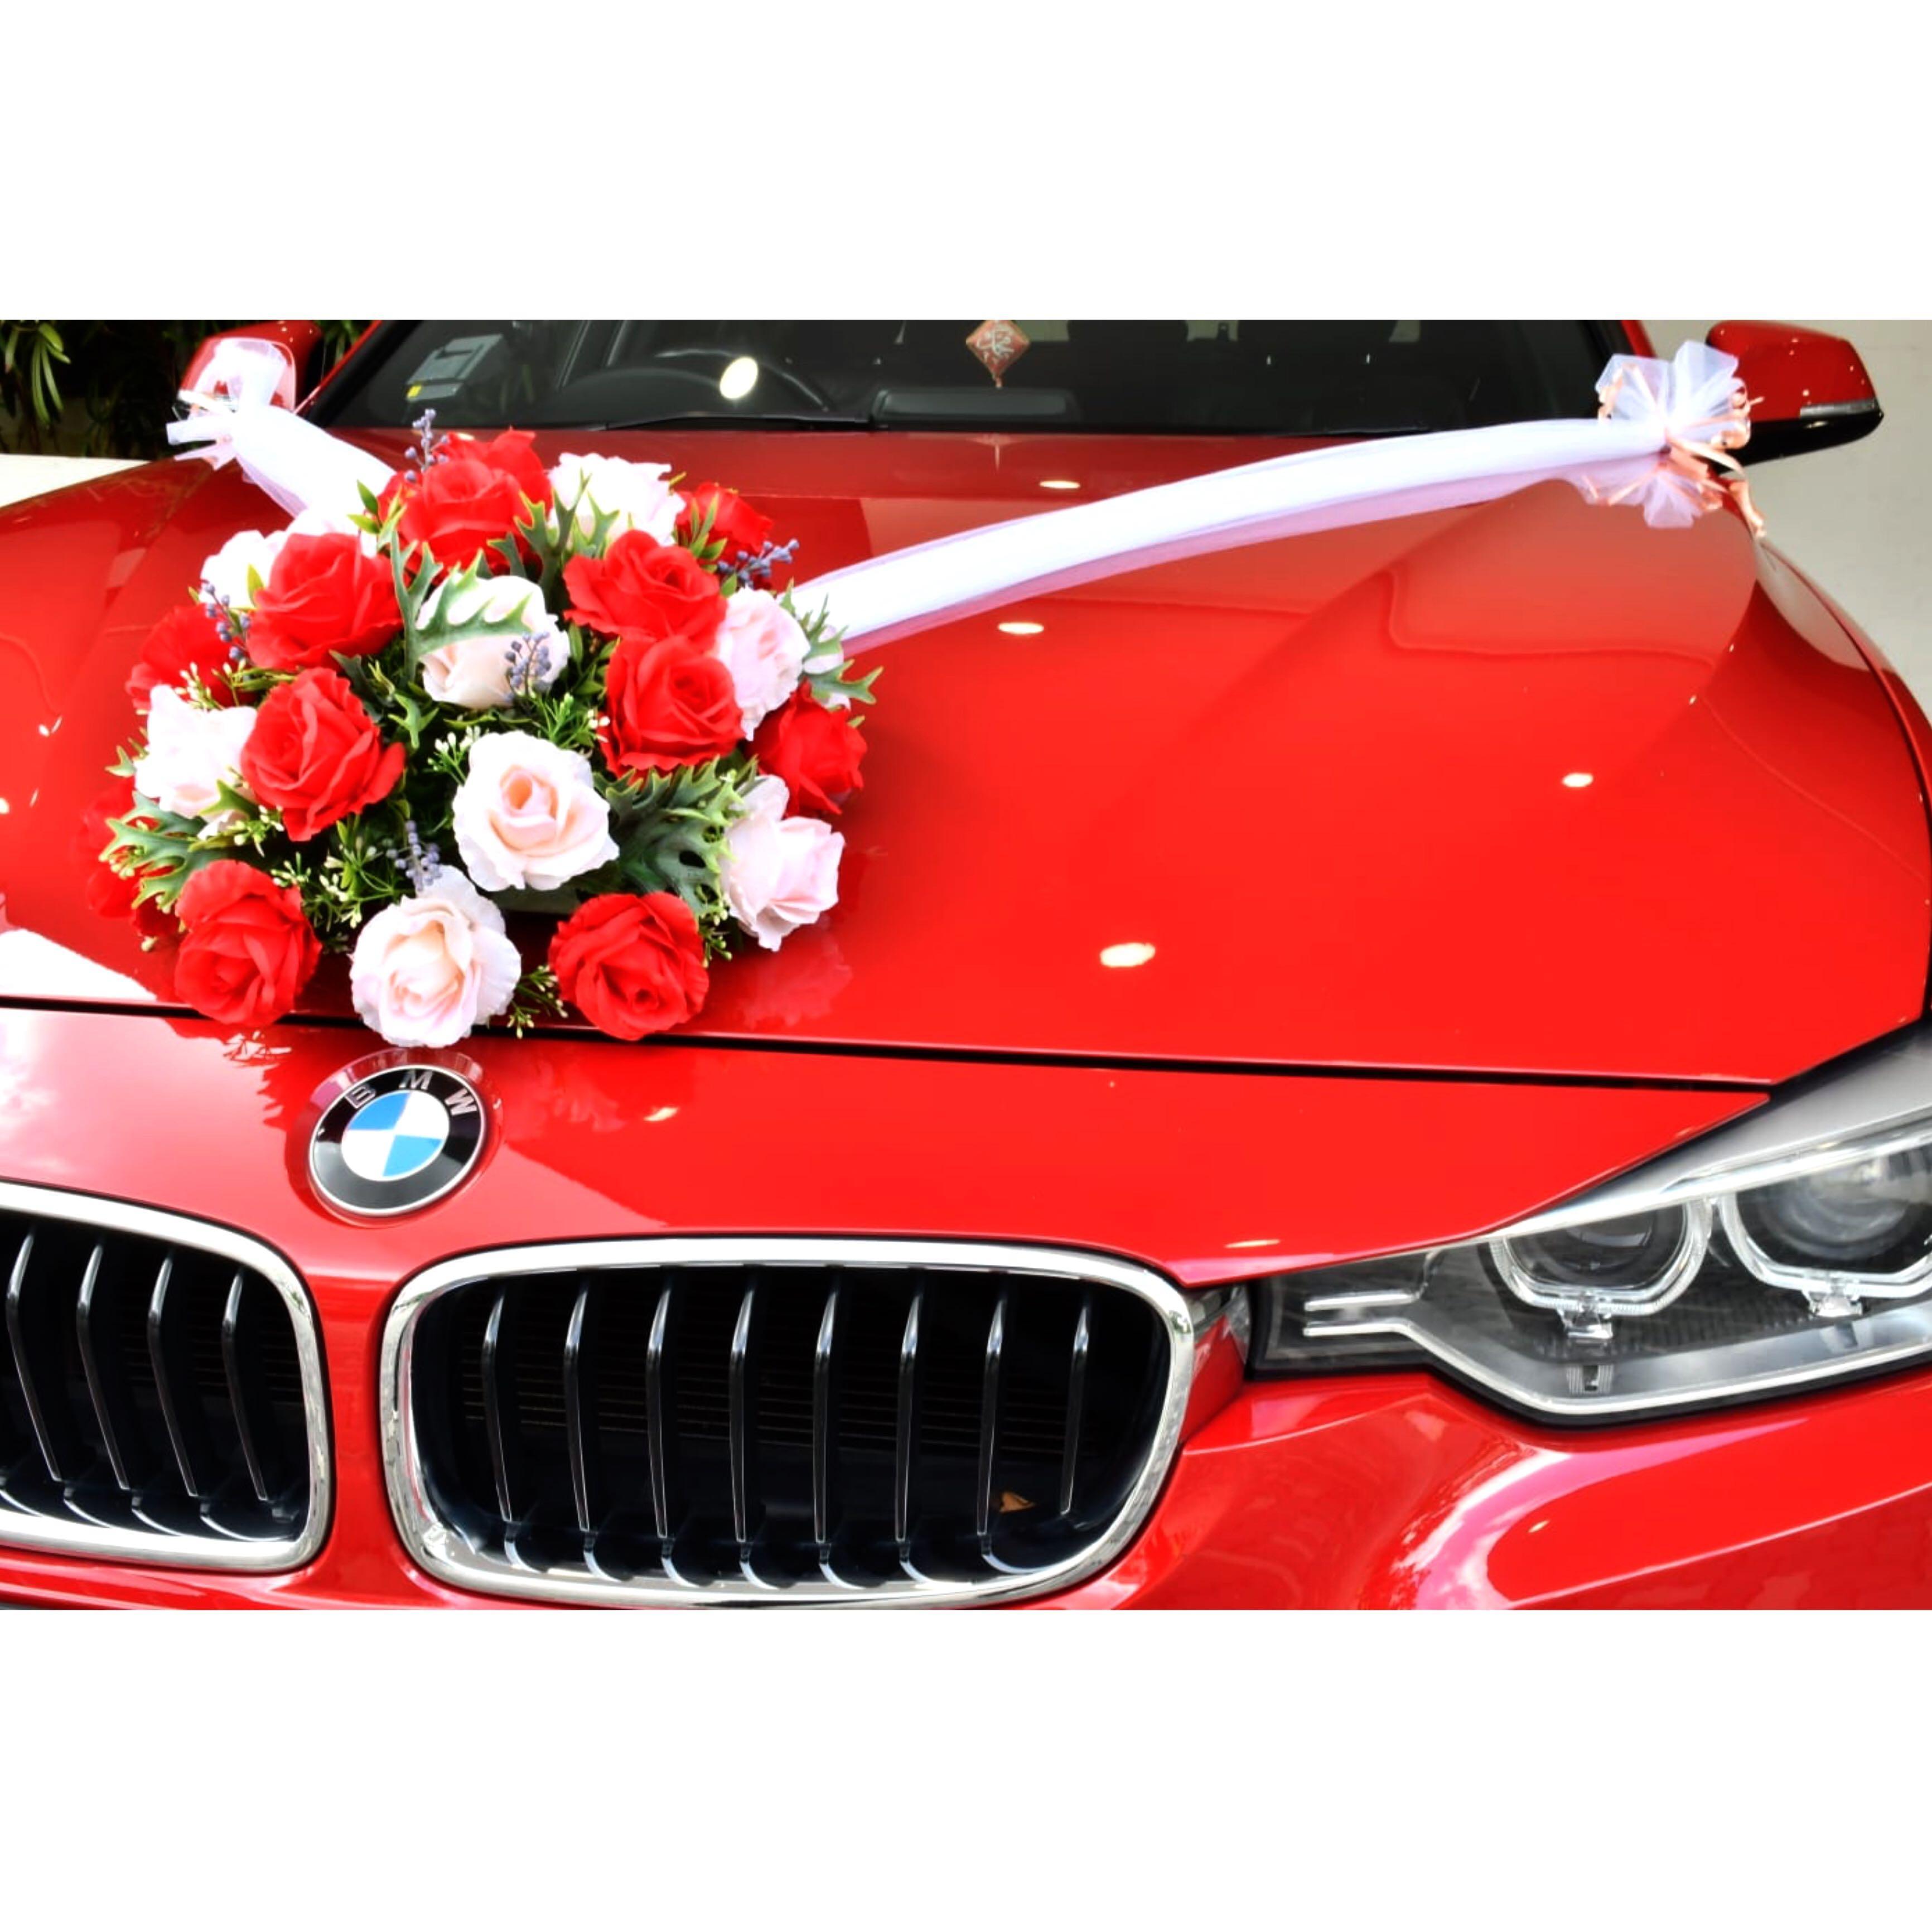 BMW Auspicious Red Wedding car rental / Limousine /